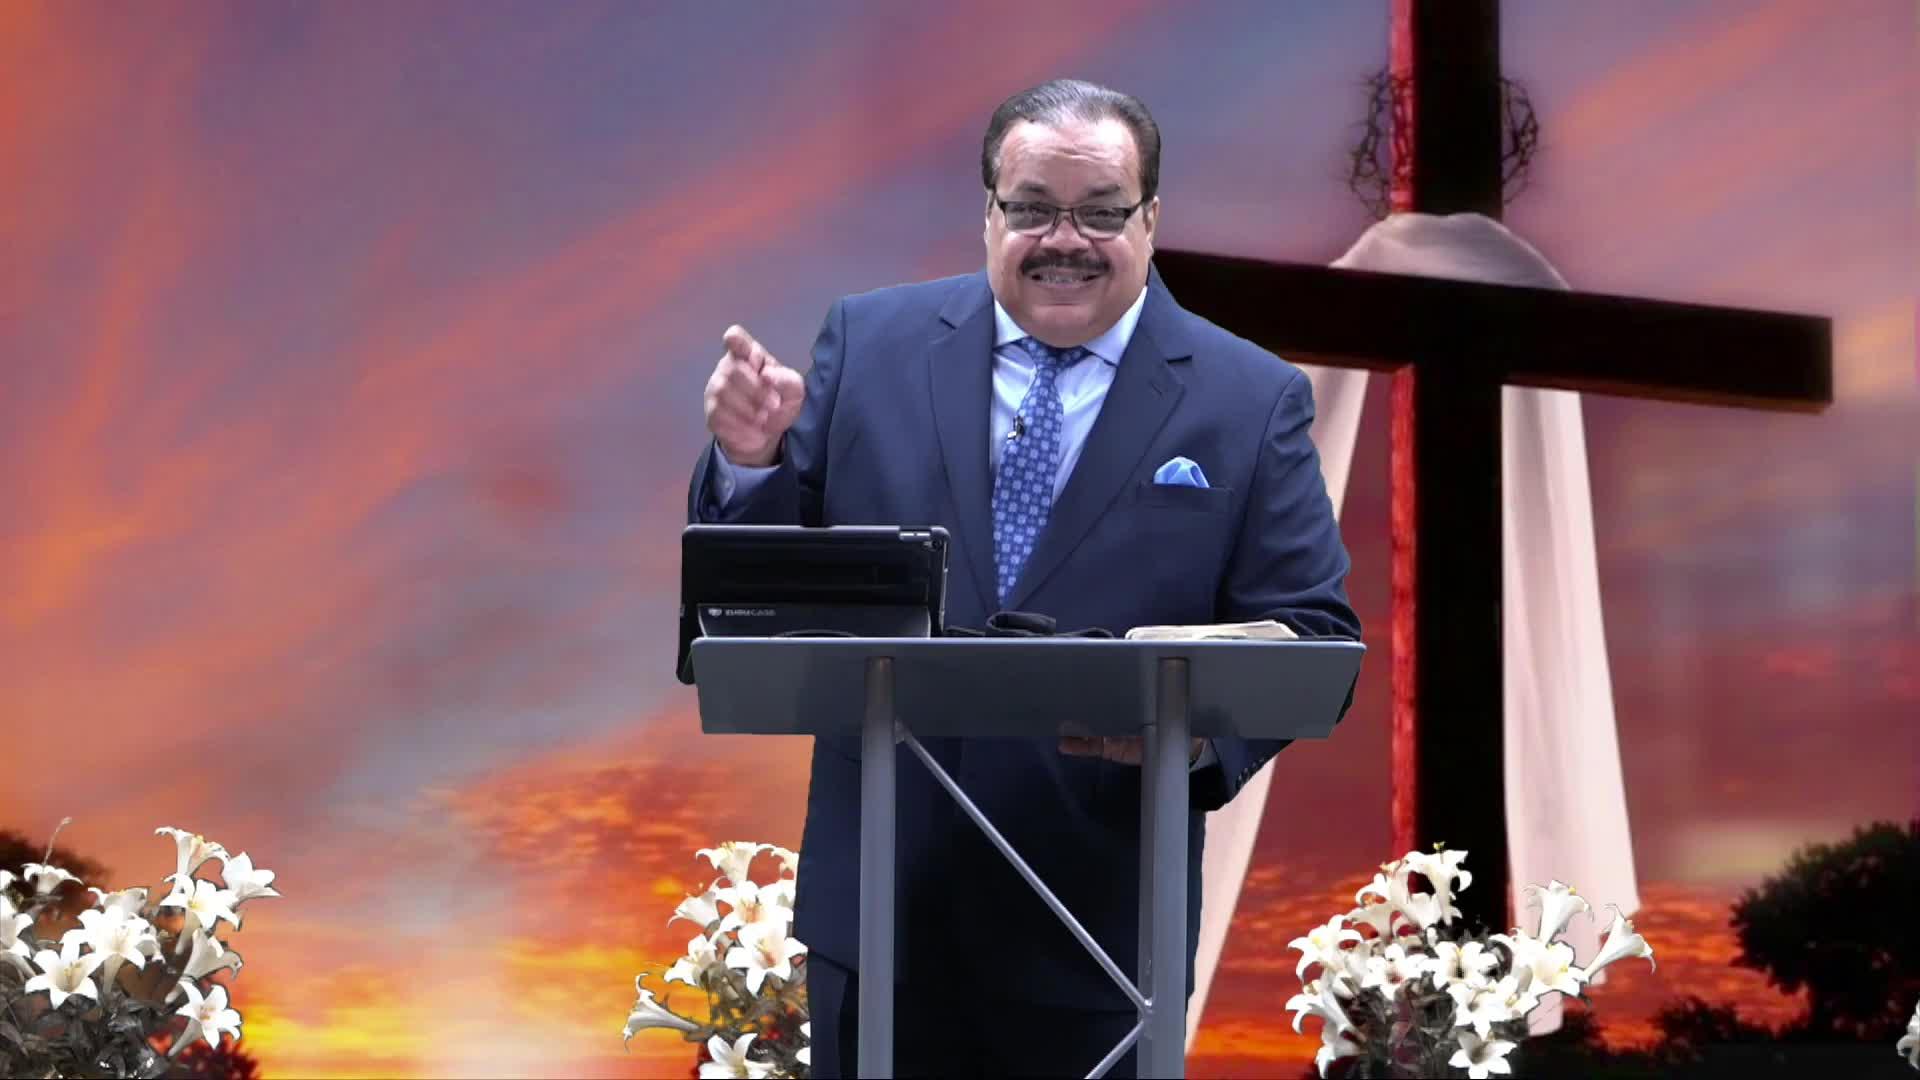 The Sayings of Jesus-Dr. Joseph Ripley, Sr.-Sun. April 4th, 2021@9AM